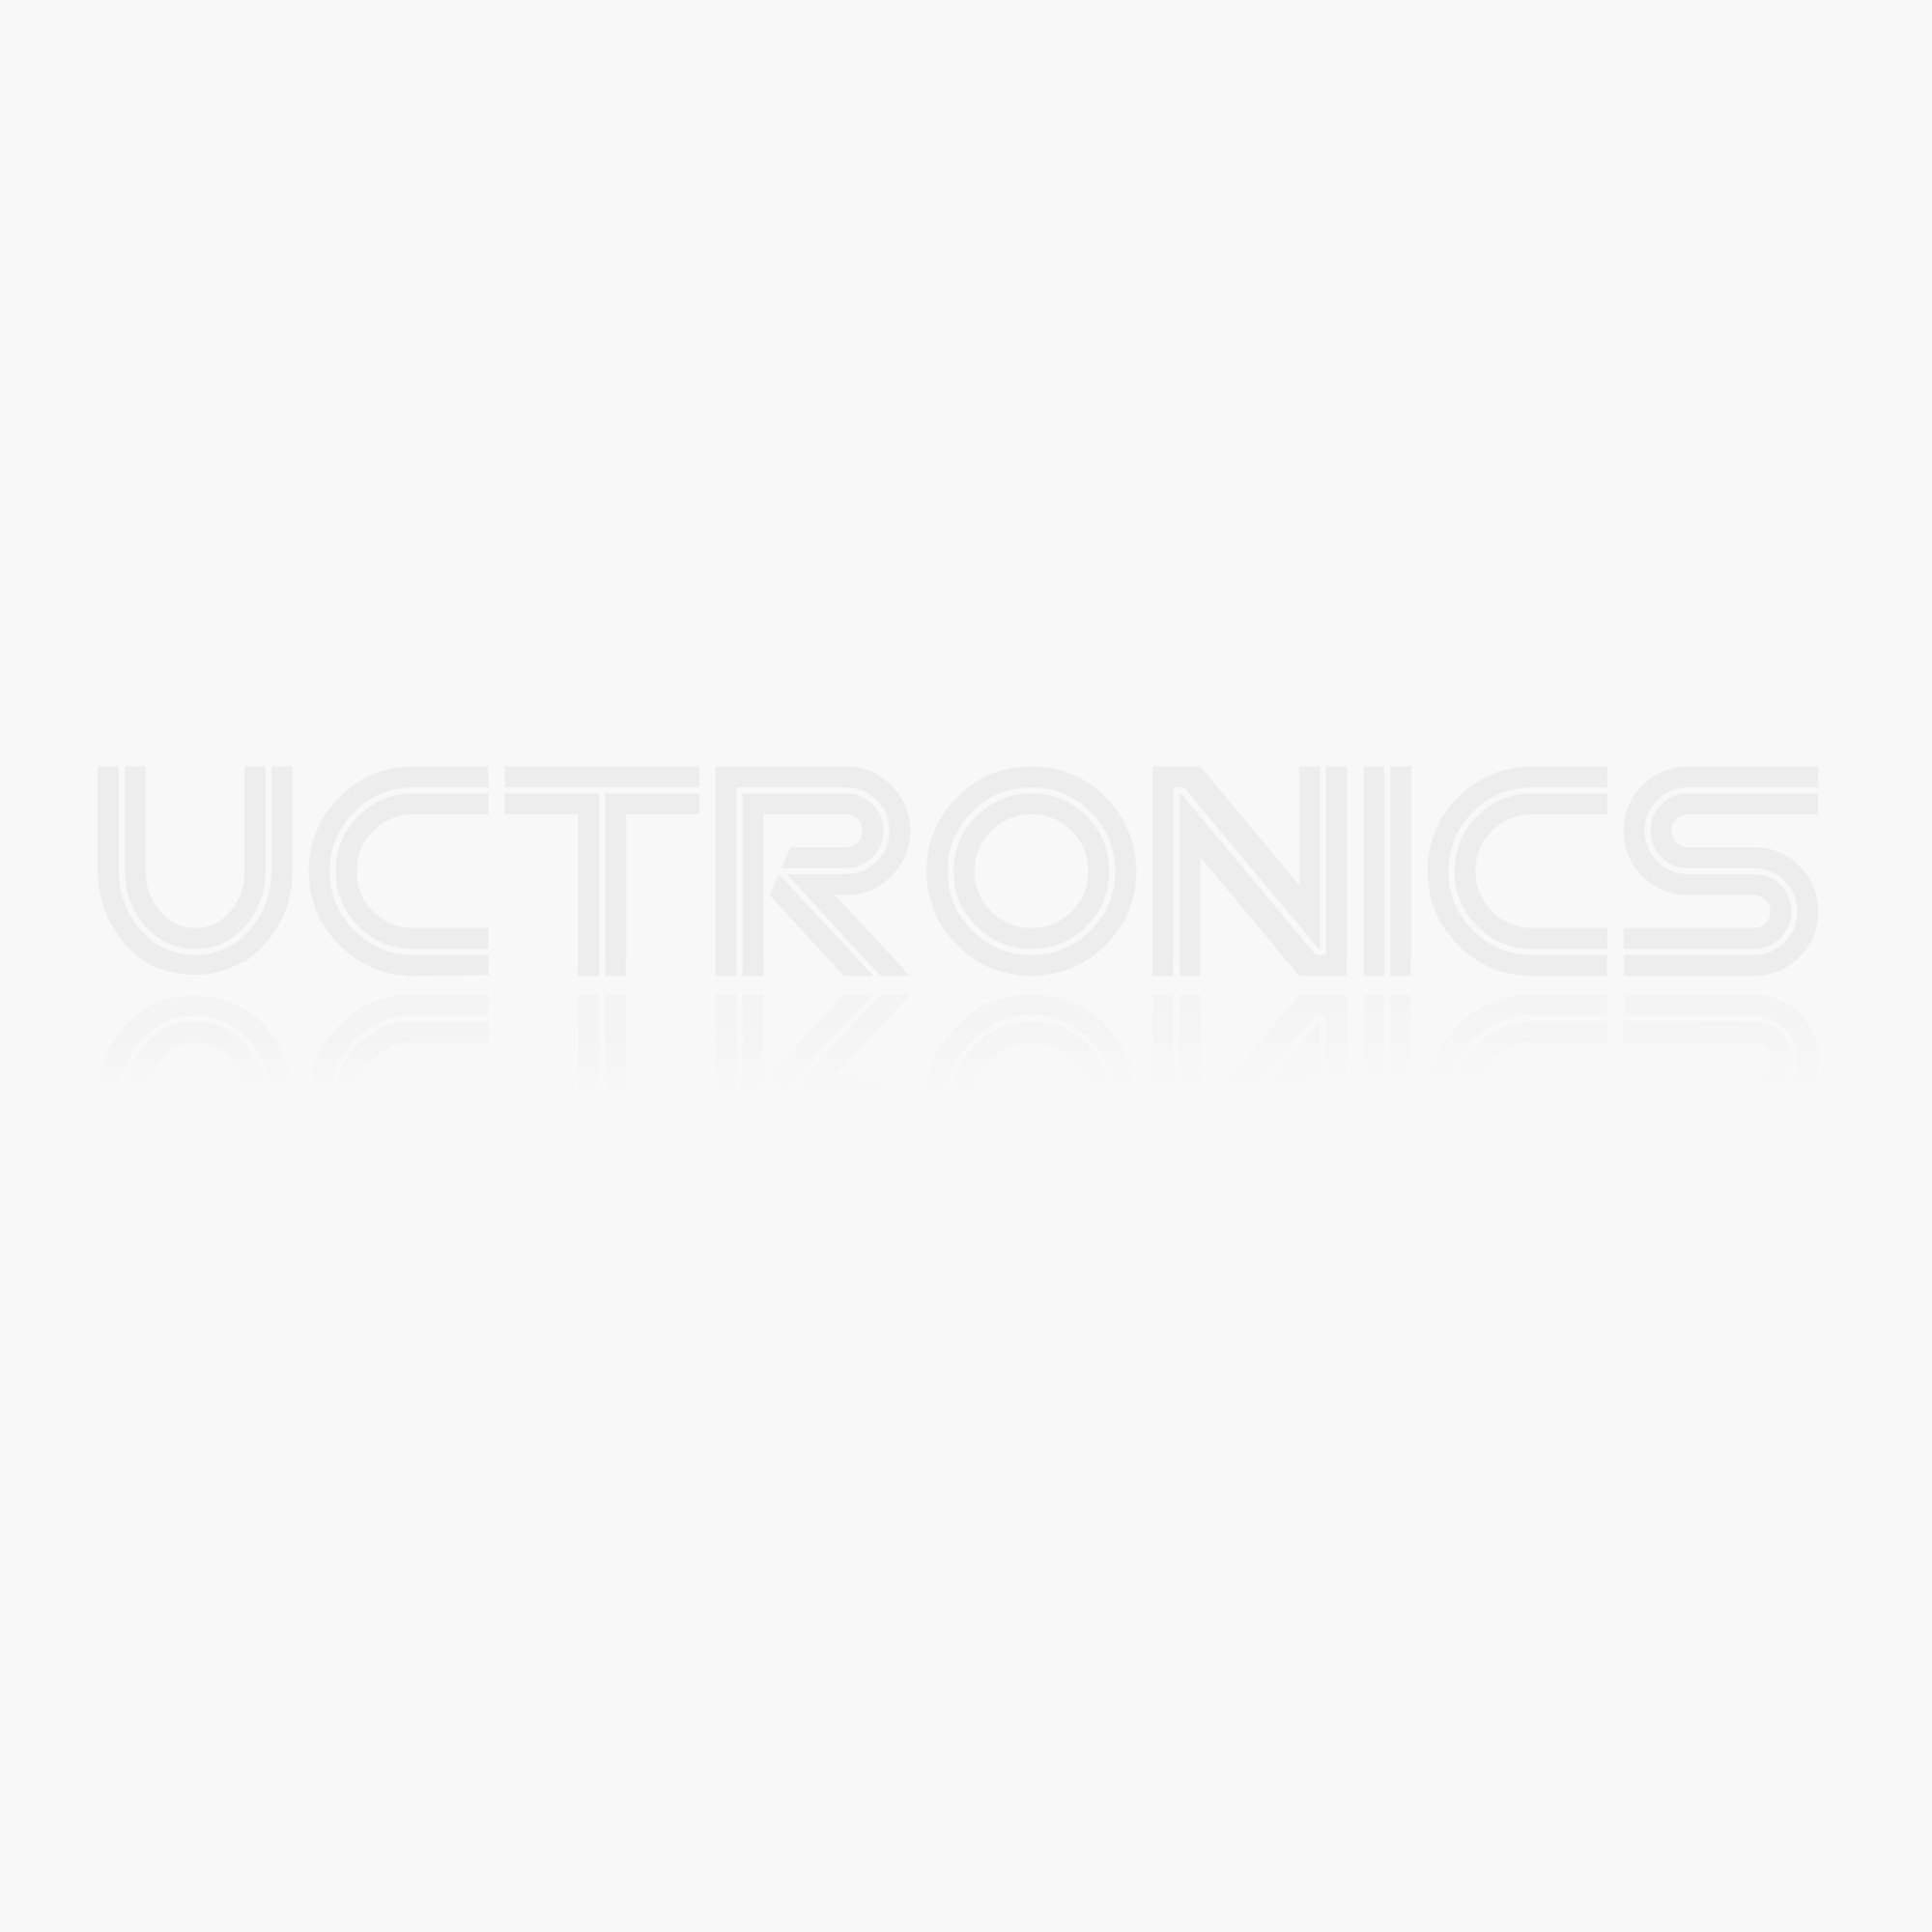 Nano Terminal Adapter kits for DIY suitable for Arduino Nano V3.0 ATMEGA328P